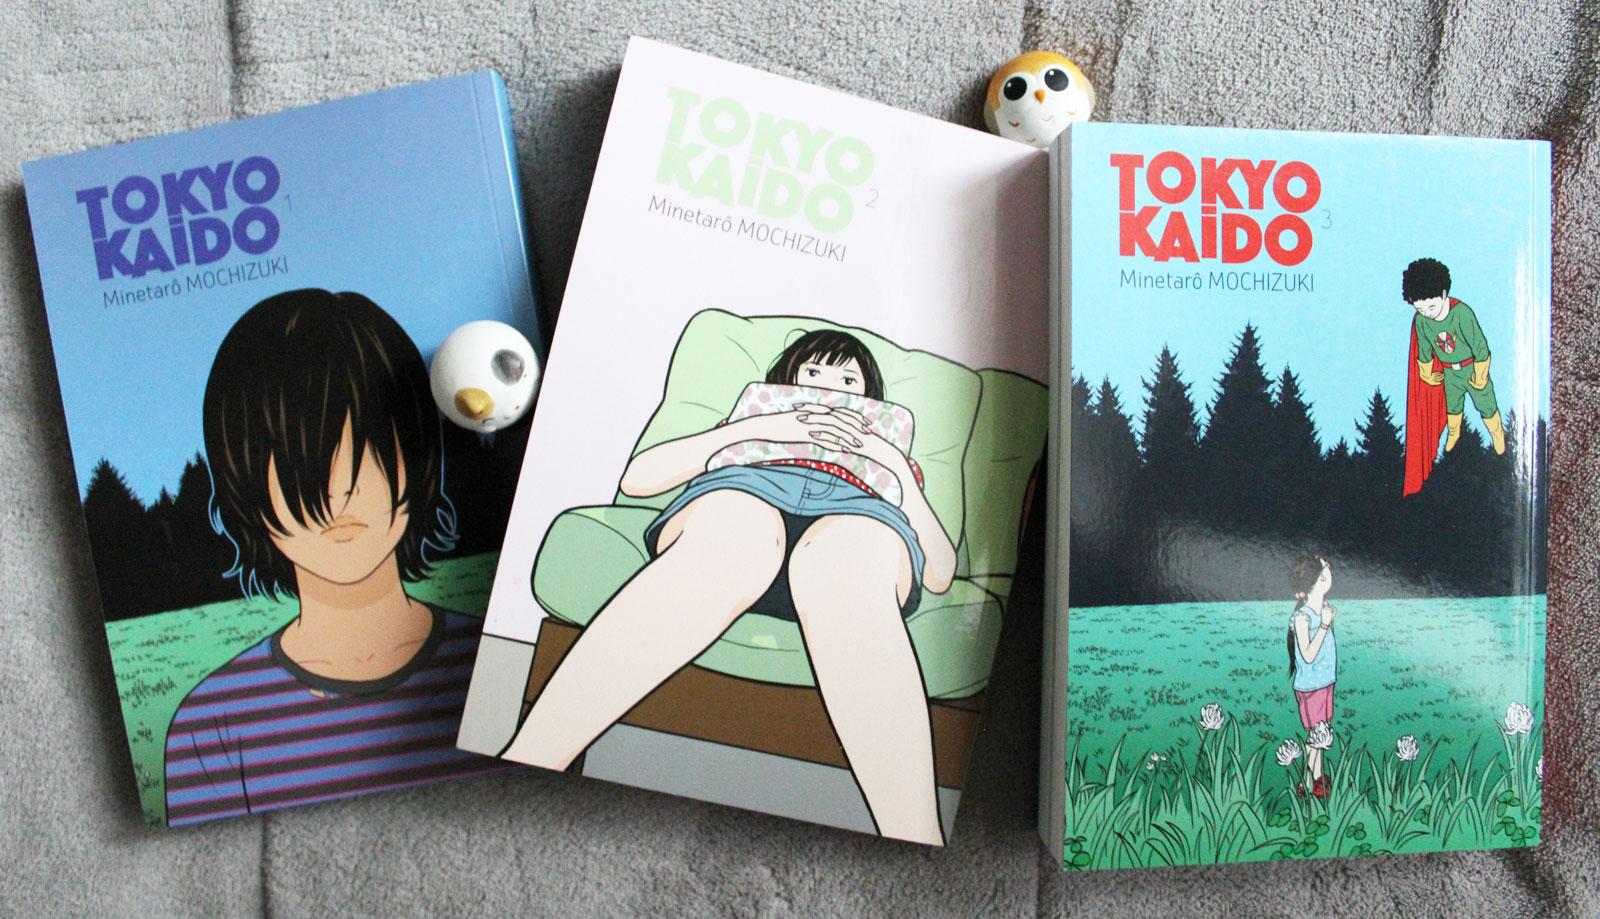 La trilogie Tokyo Kaido de Minetaro Mochizuki